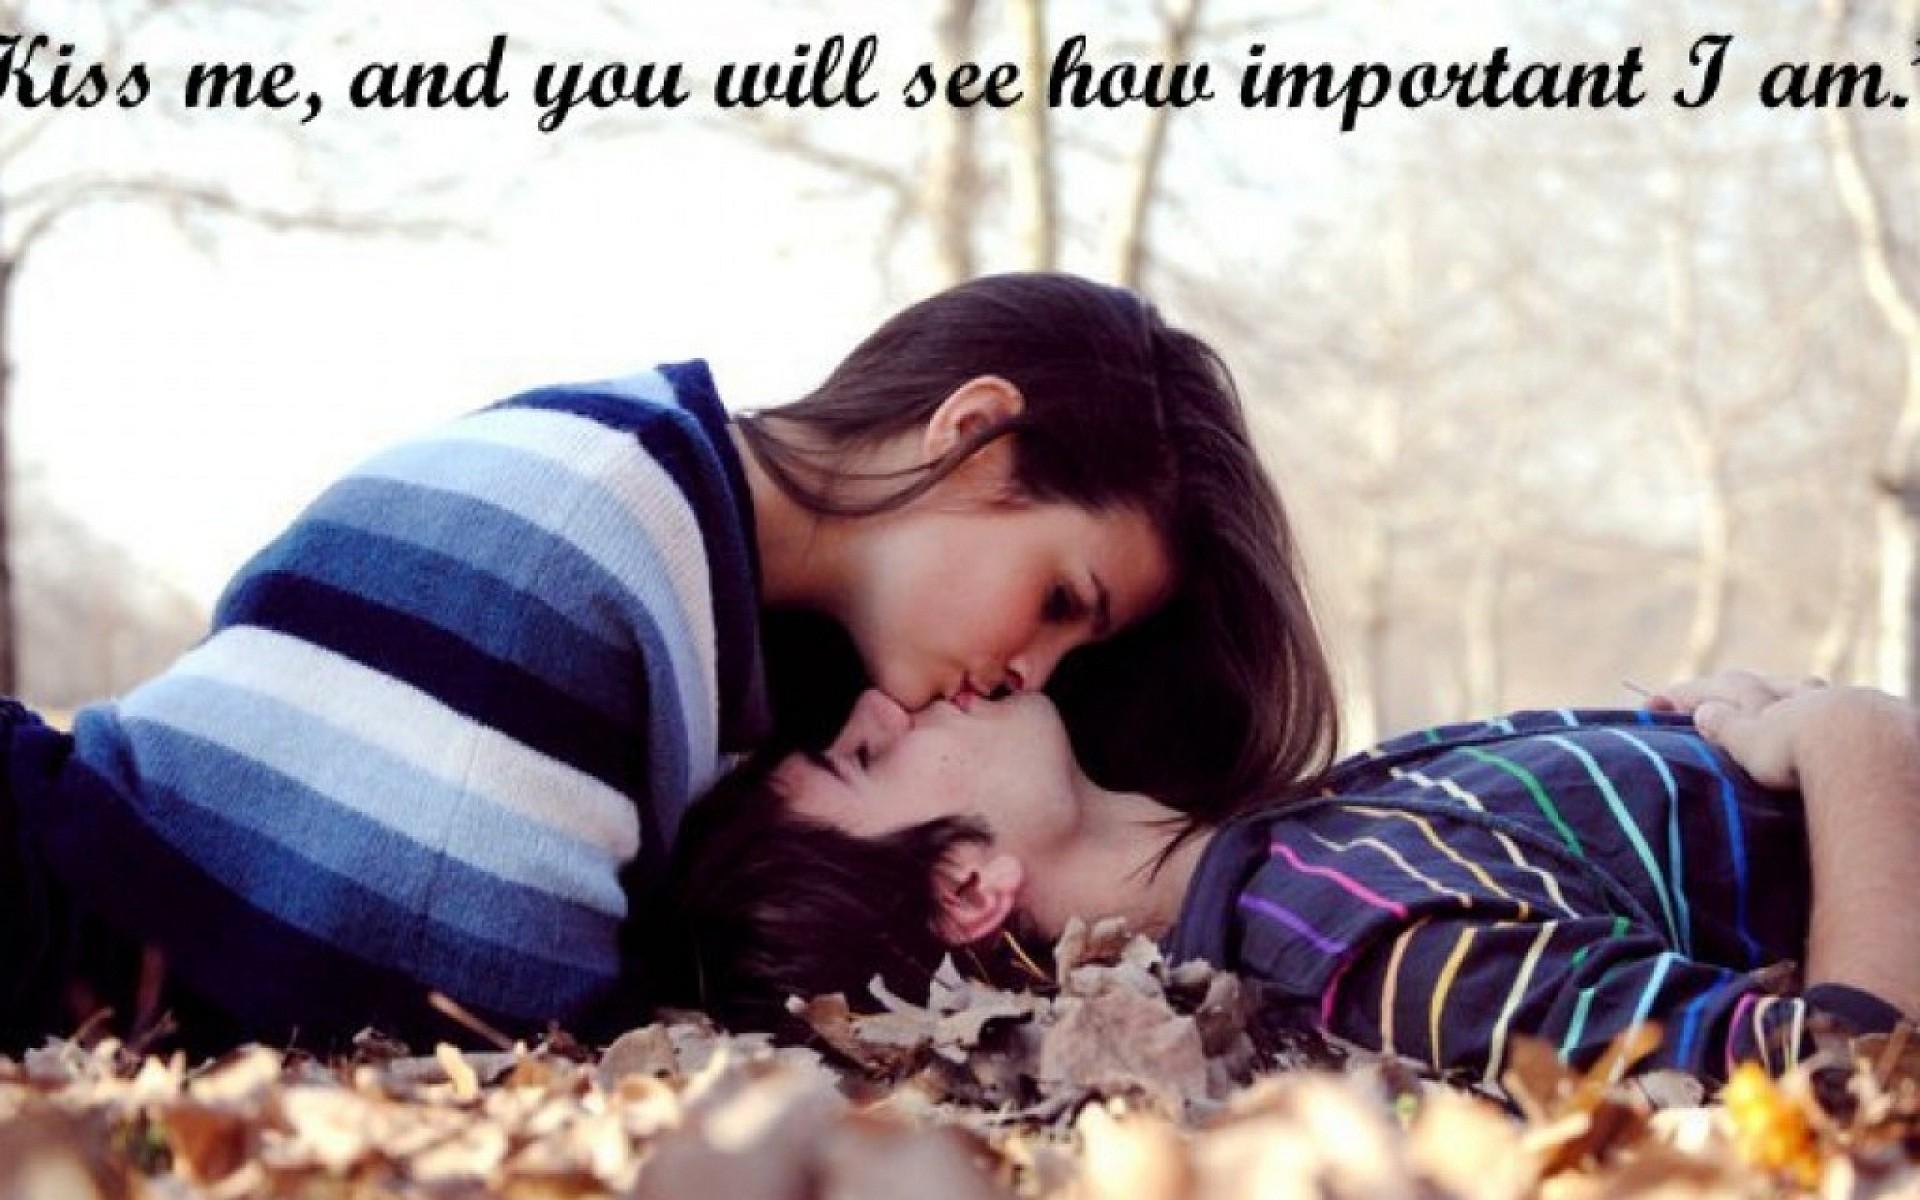 kissing images kissing images kissing images …